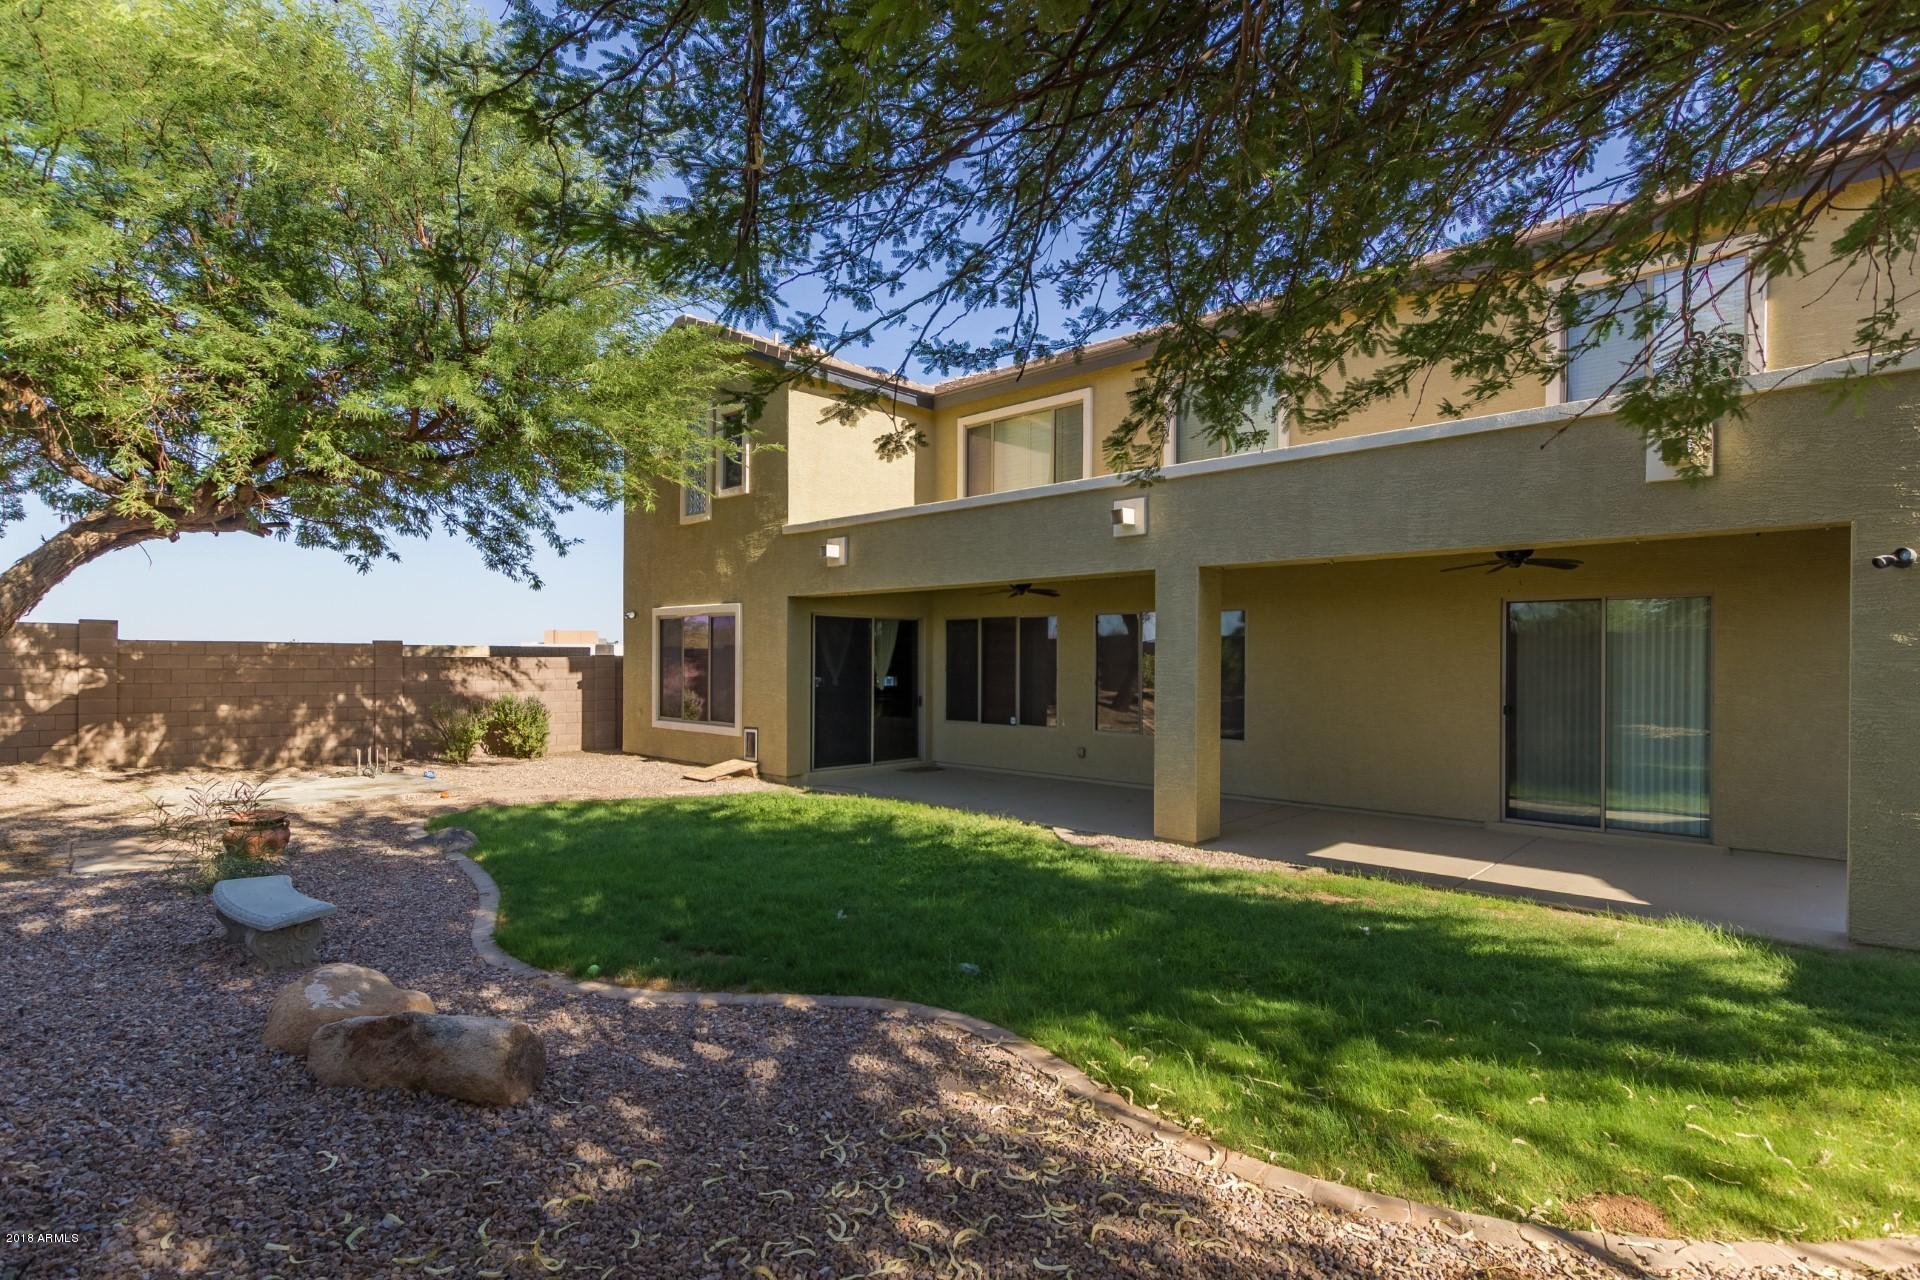 MLS 5787413 13502 W MONTEREY Way, Avondale, AZ 85392 Avondale AZ Luxury